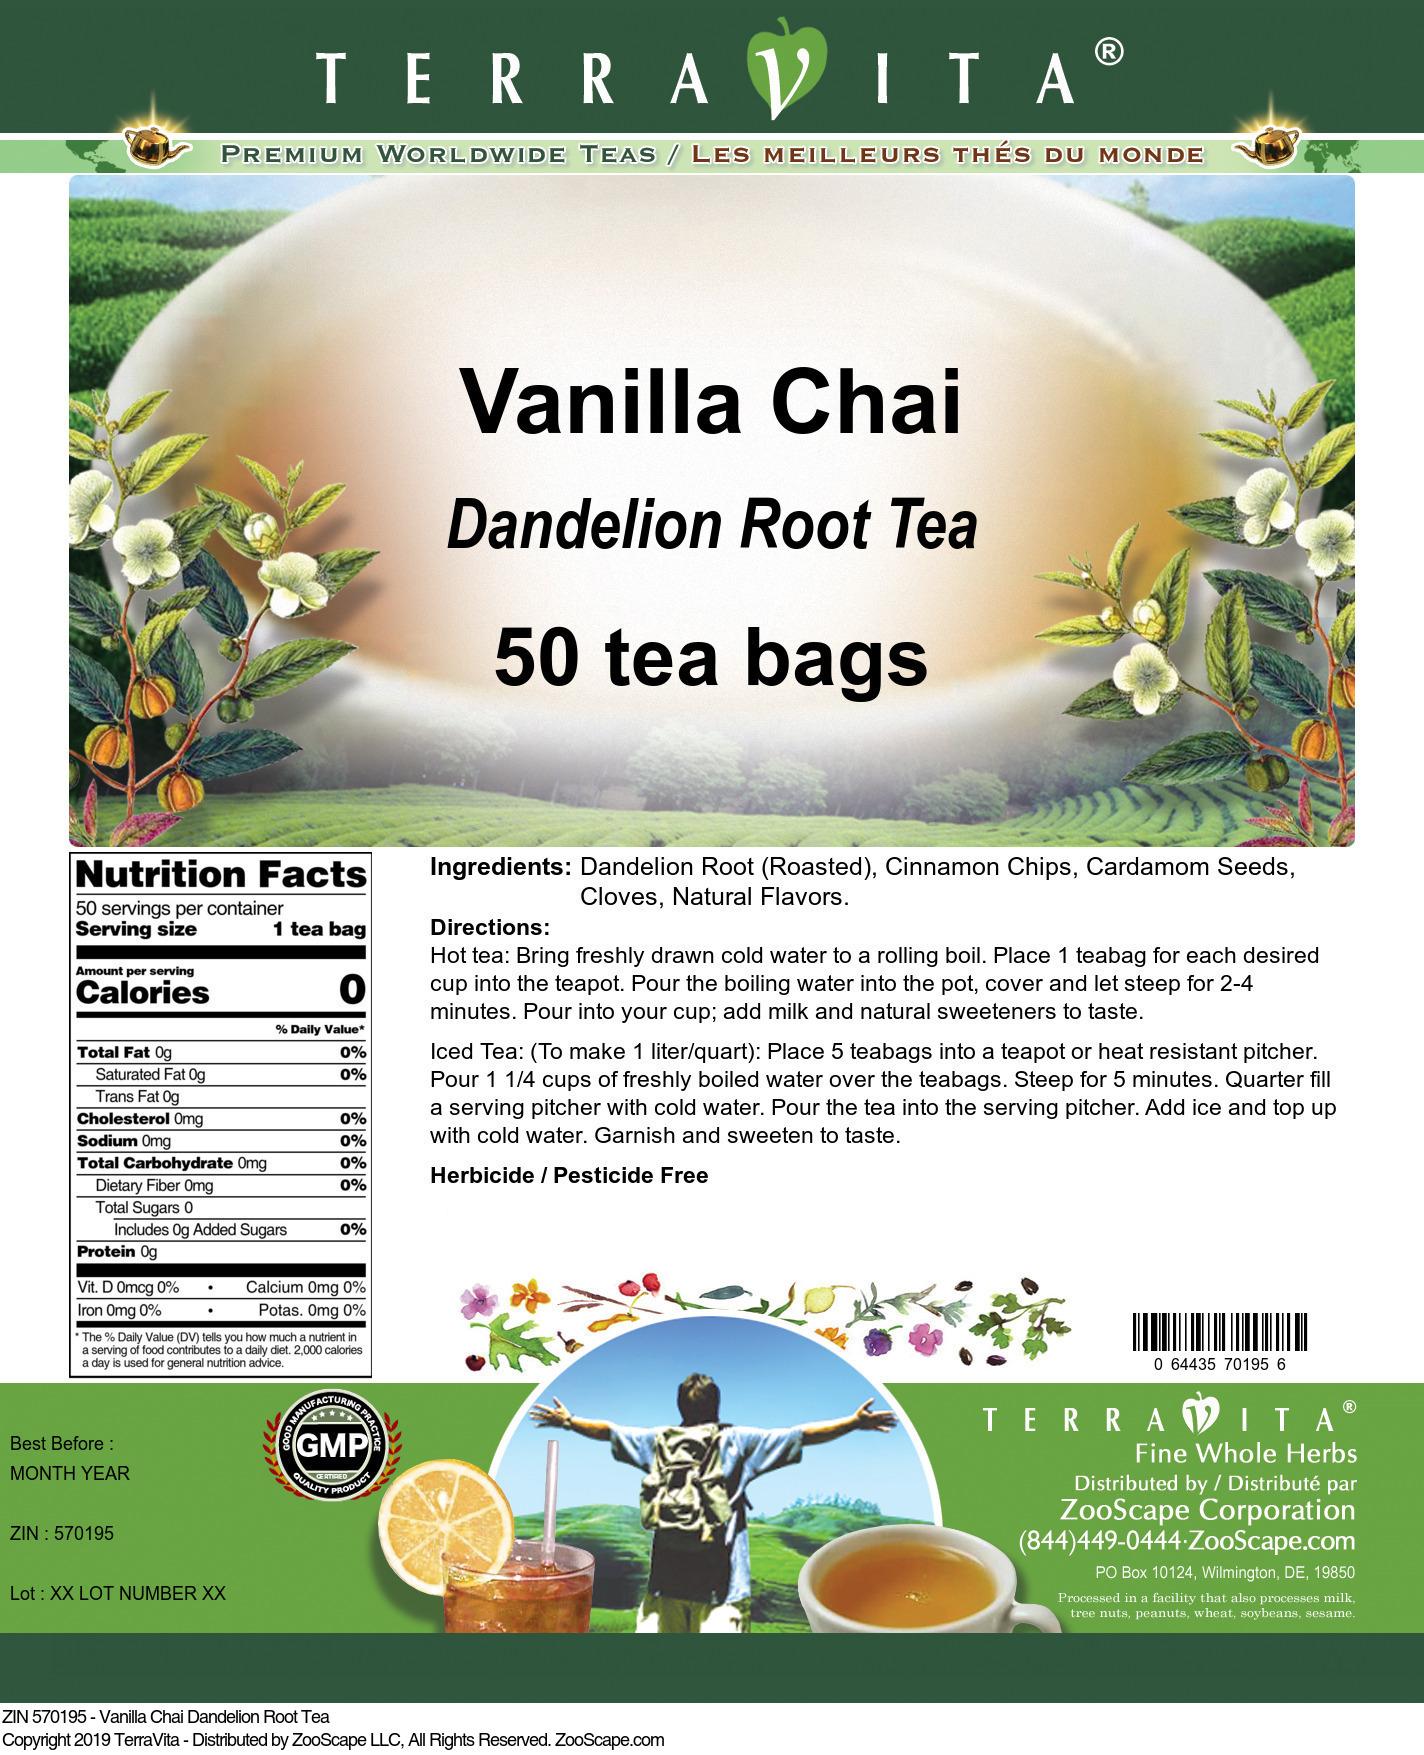 Vanilla Chai Dandelion Root